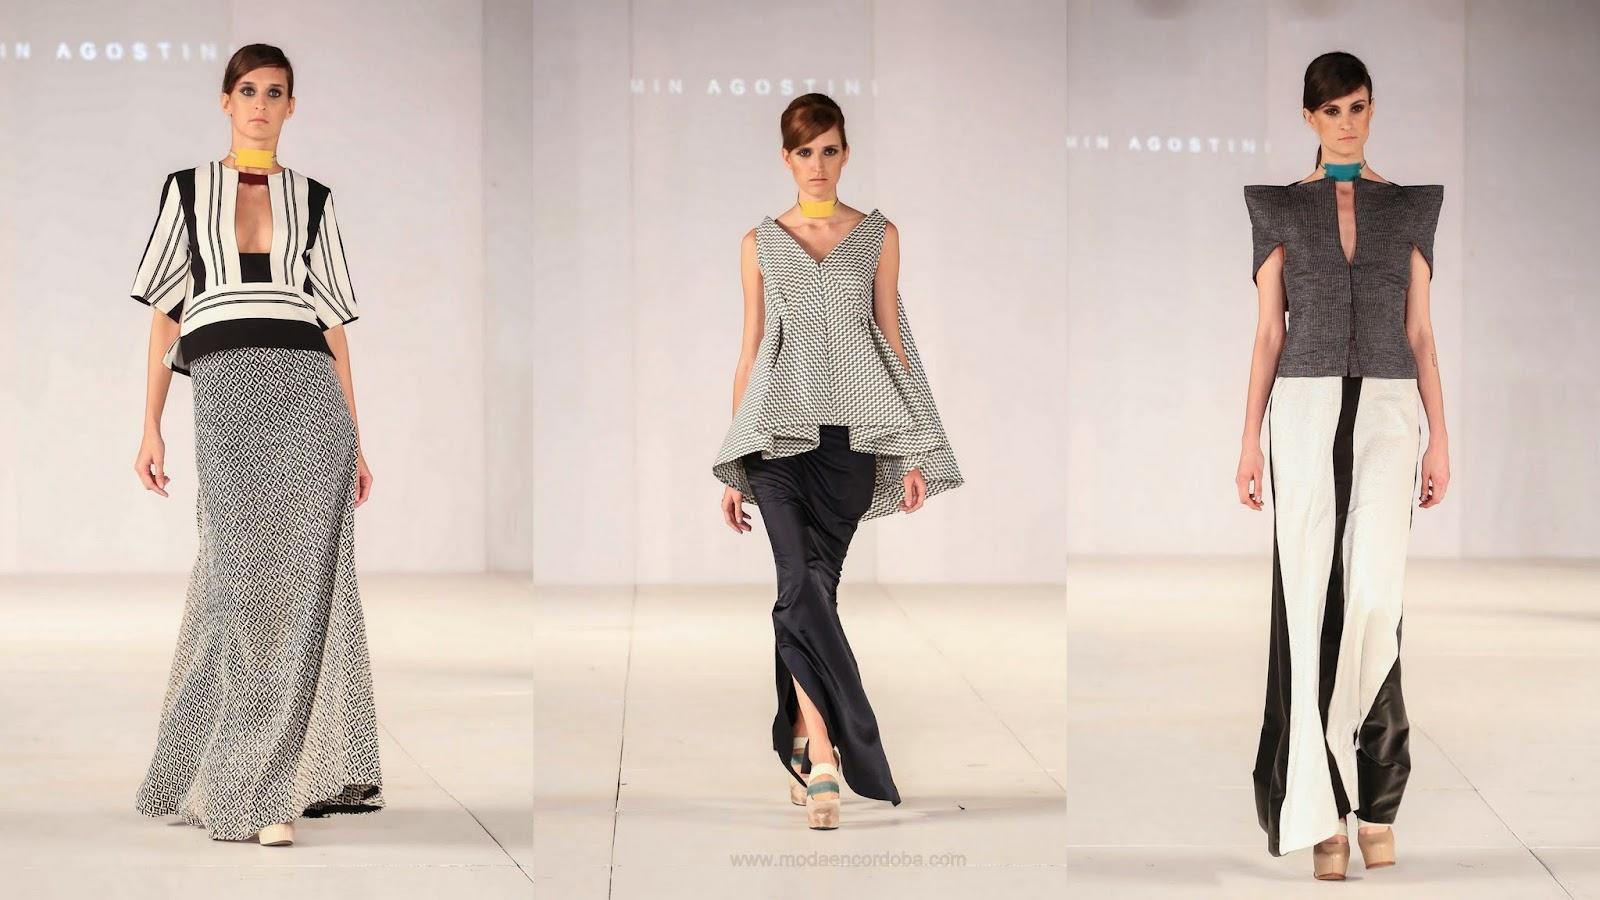 moda argentina 2015